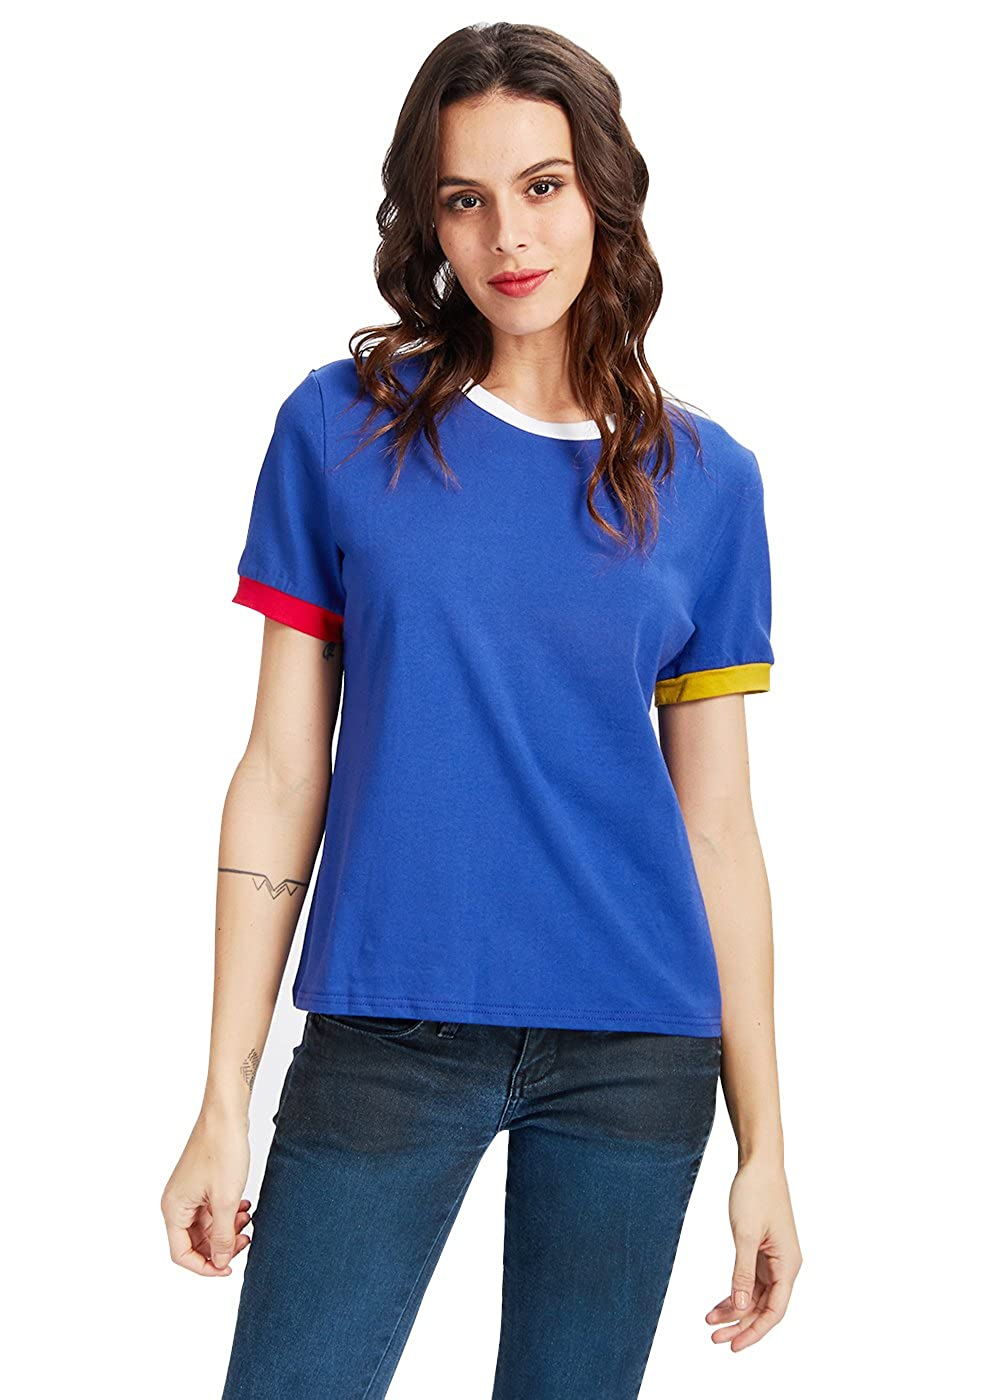 28b5a7184b3 Amazon.com  Uideazone Womens Teens Harajuku Casual Crop Top Short Sleeve Tee  Shirt Cotton  Clothing